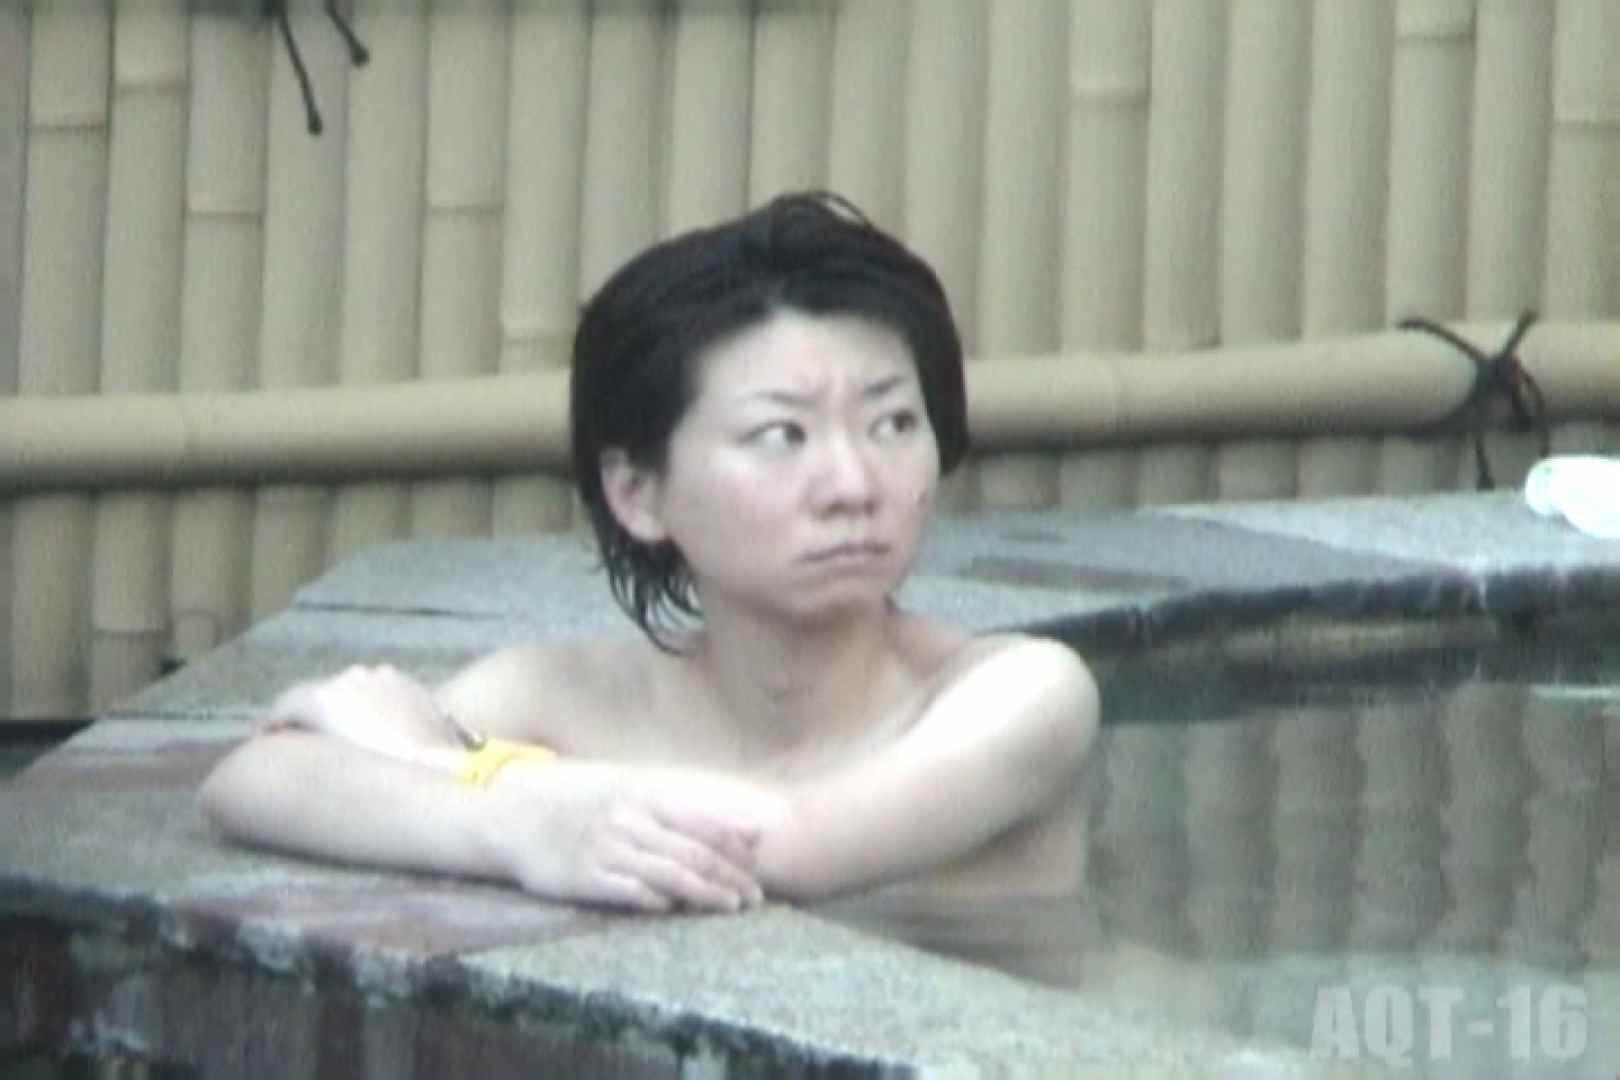 Aquaな露天風呂Vol.842 露天風呂編 | 盗撮シリーズ  82PIX 75